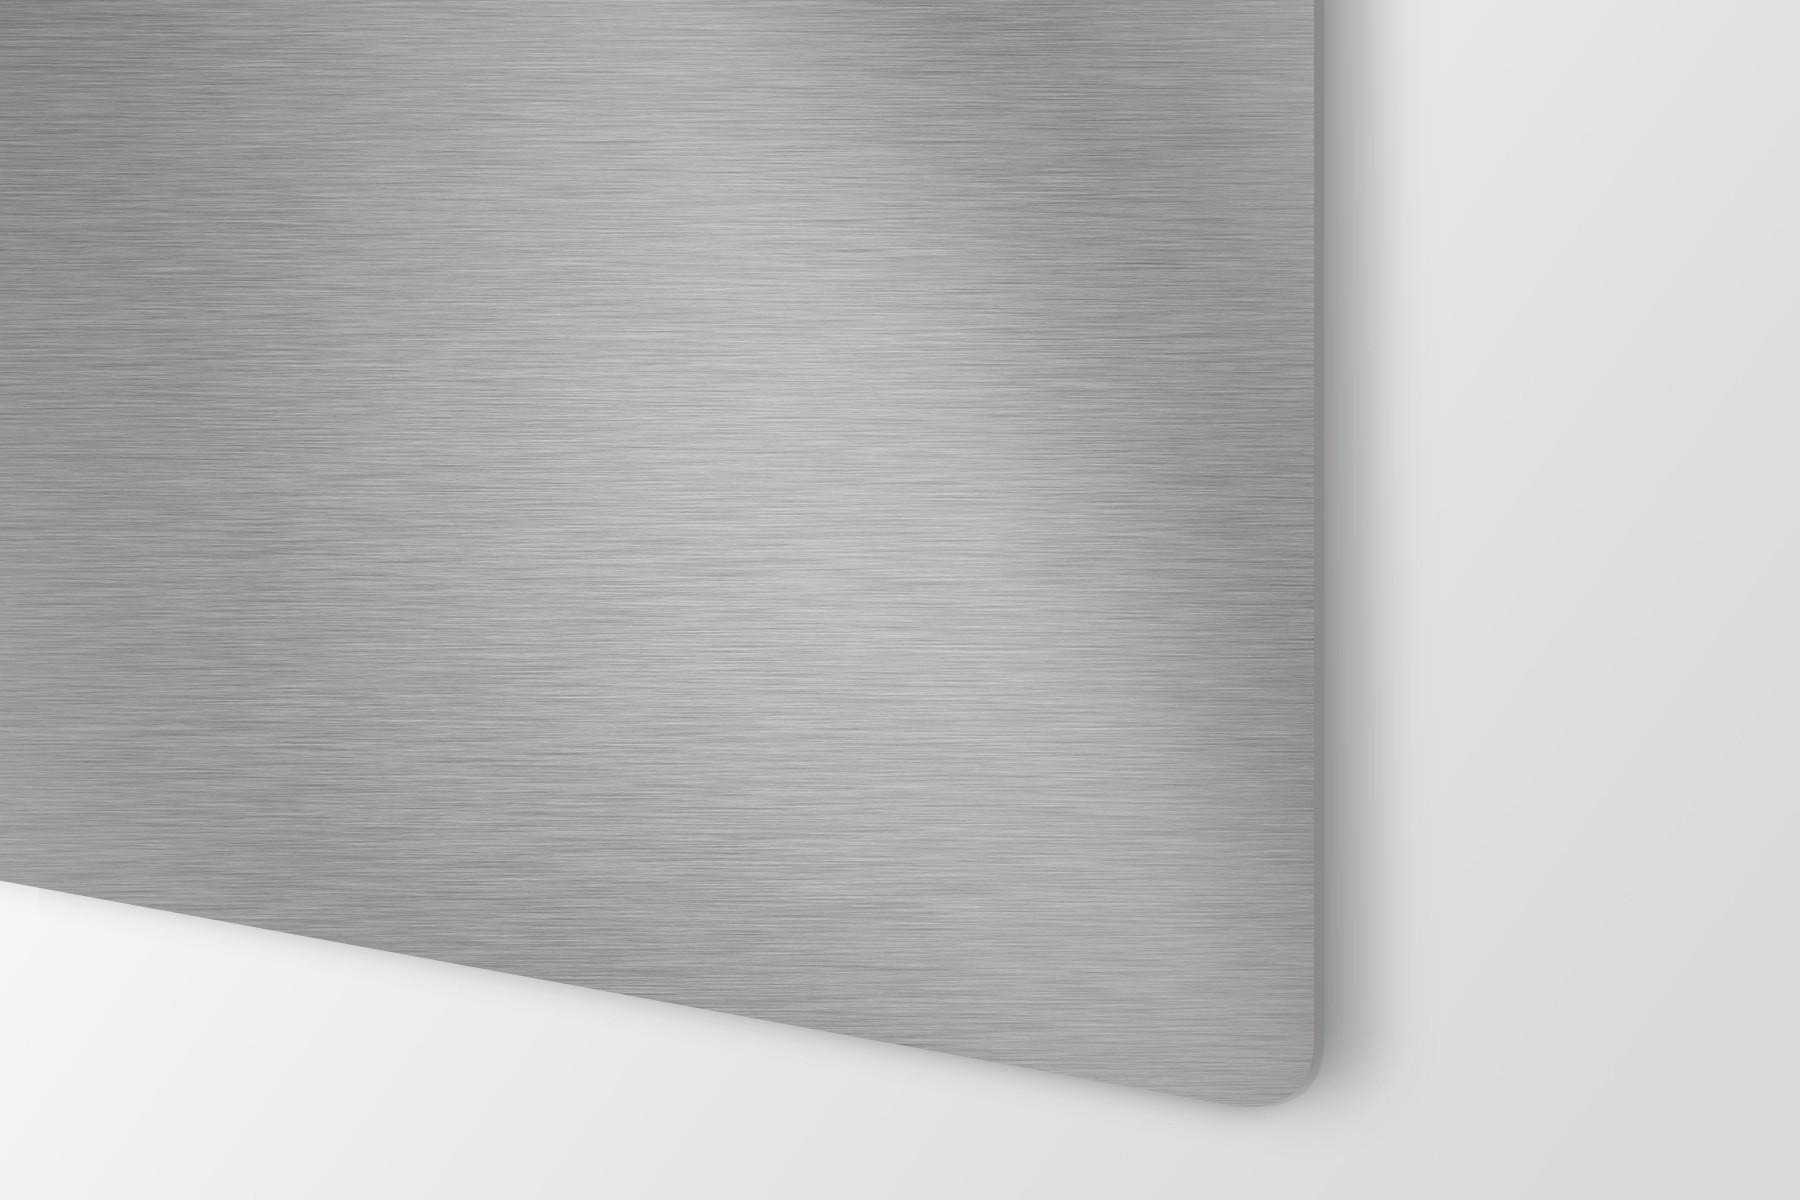 Niro 1.4301 Cepillado 1000x500x0,8mm